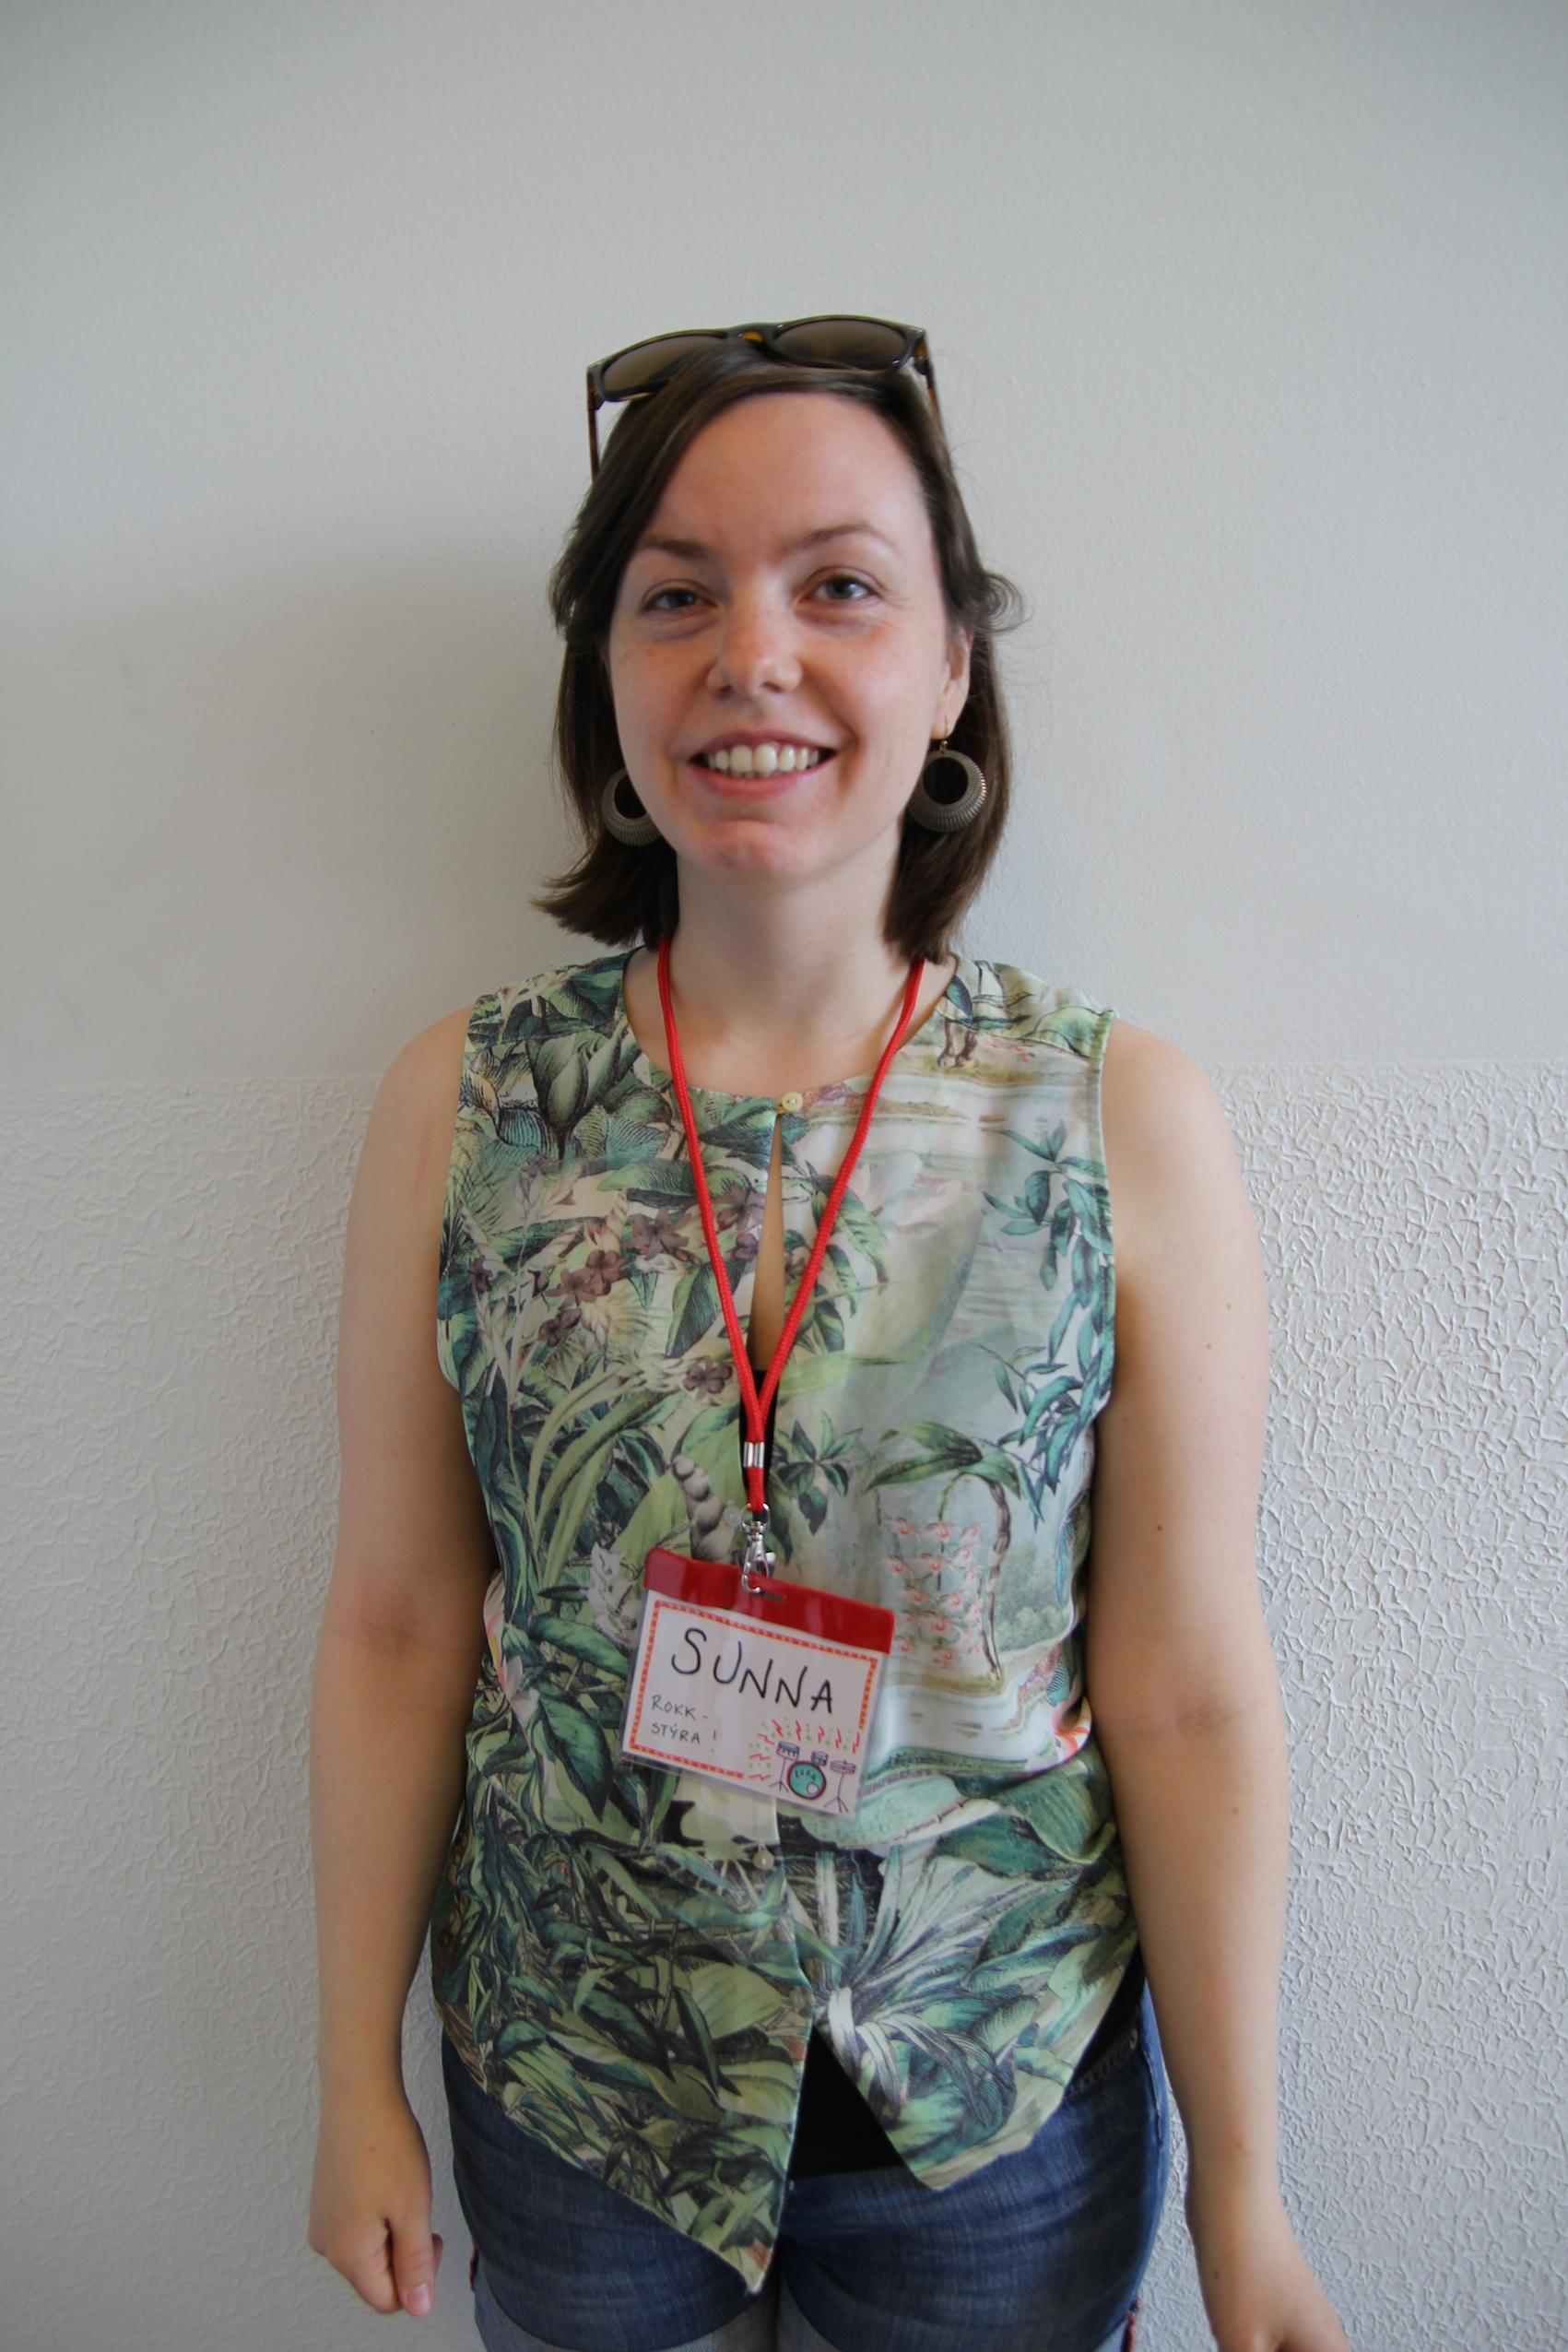 Sunna Ingólfsdóttir